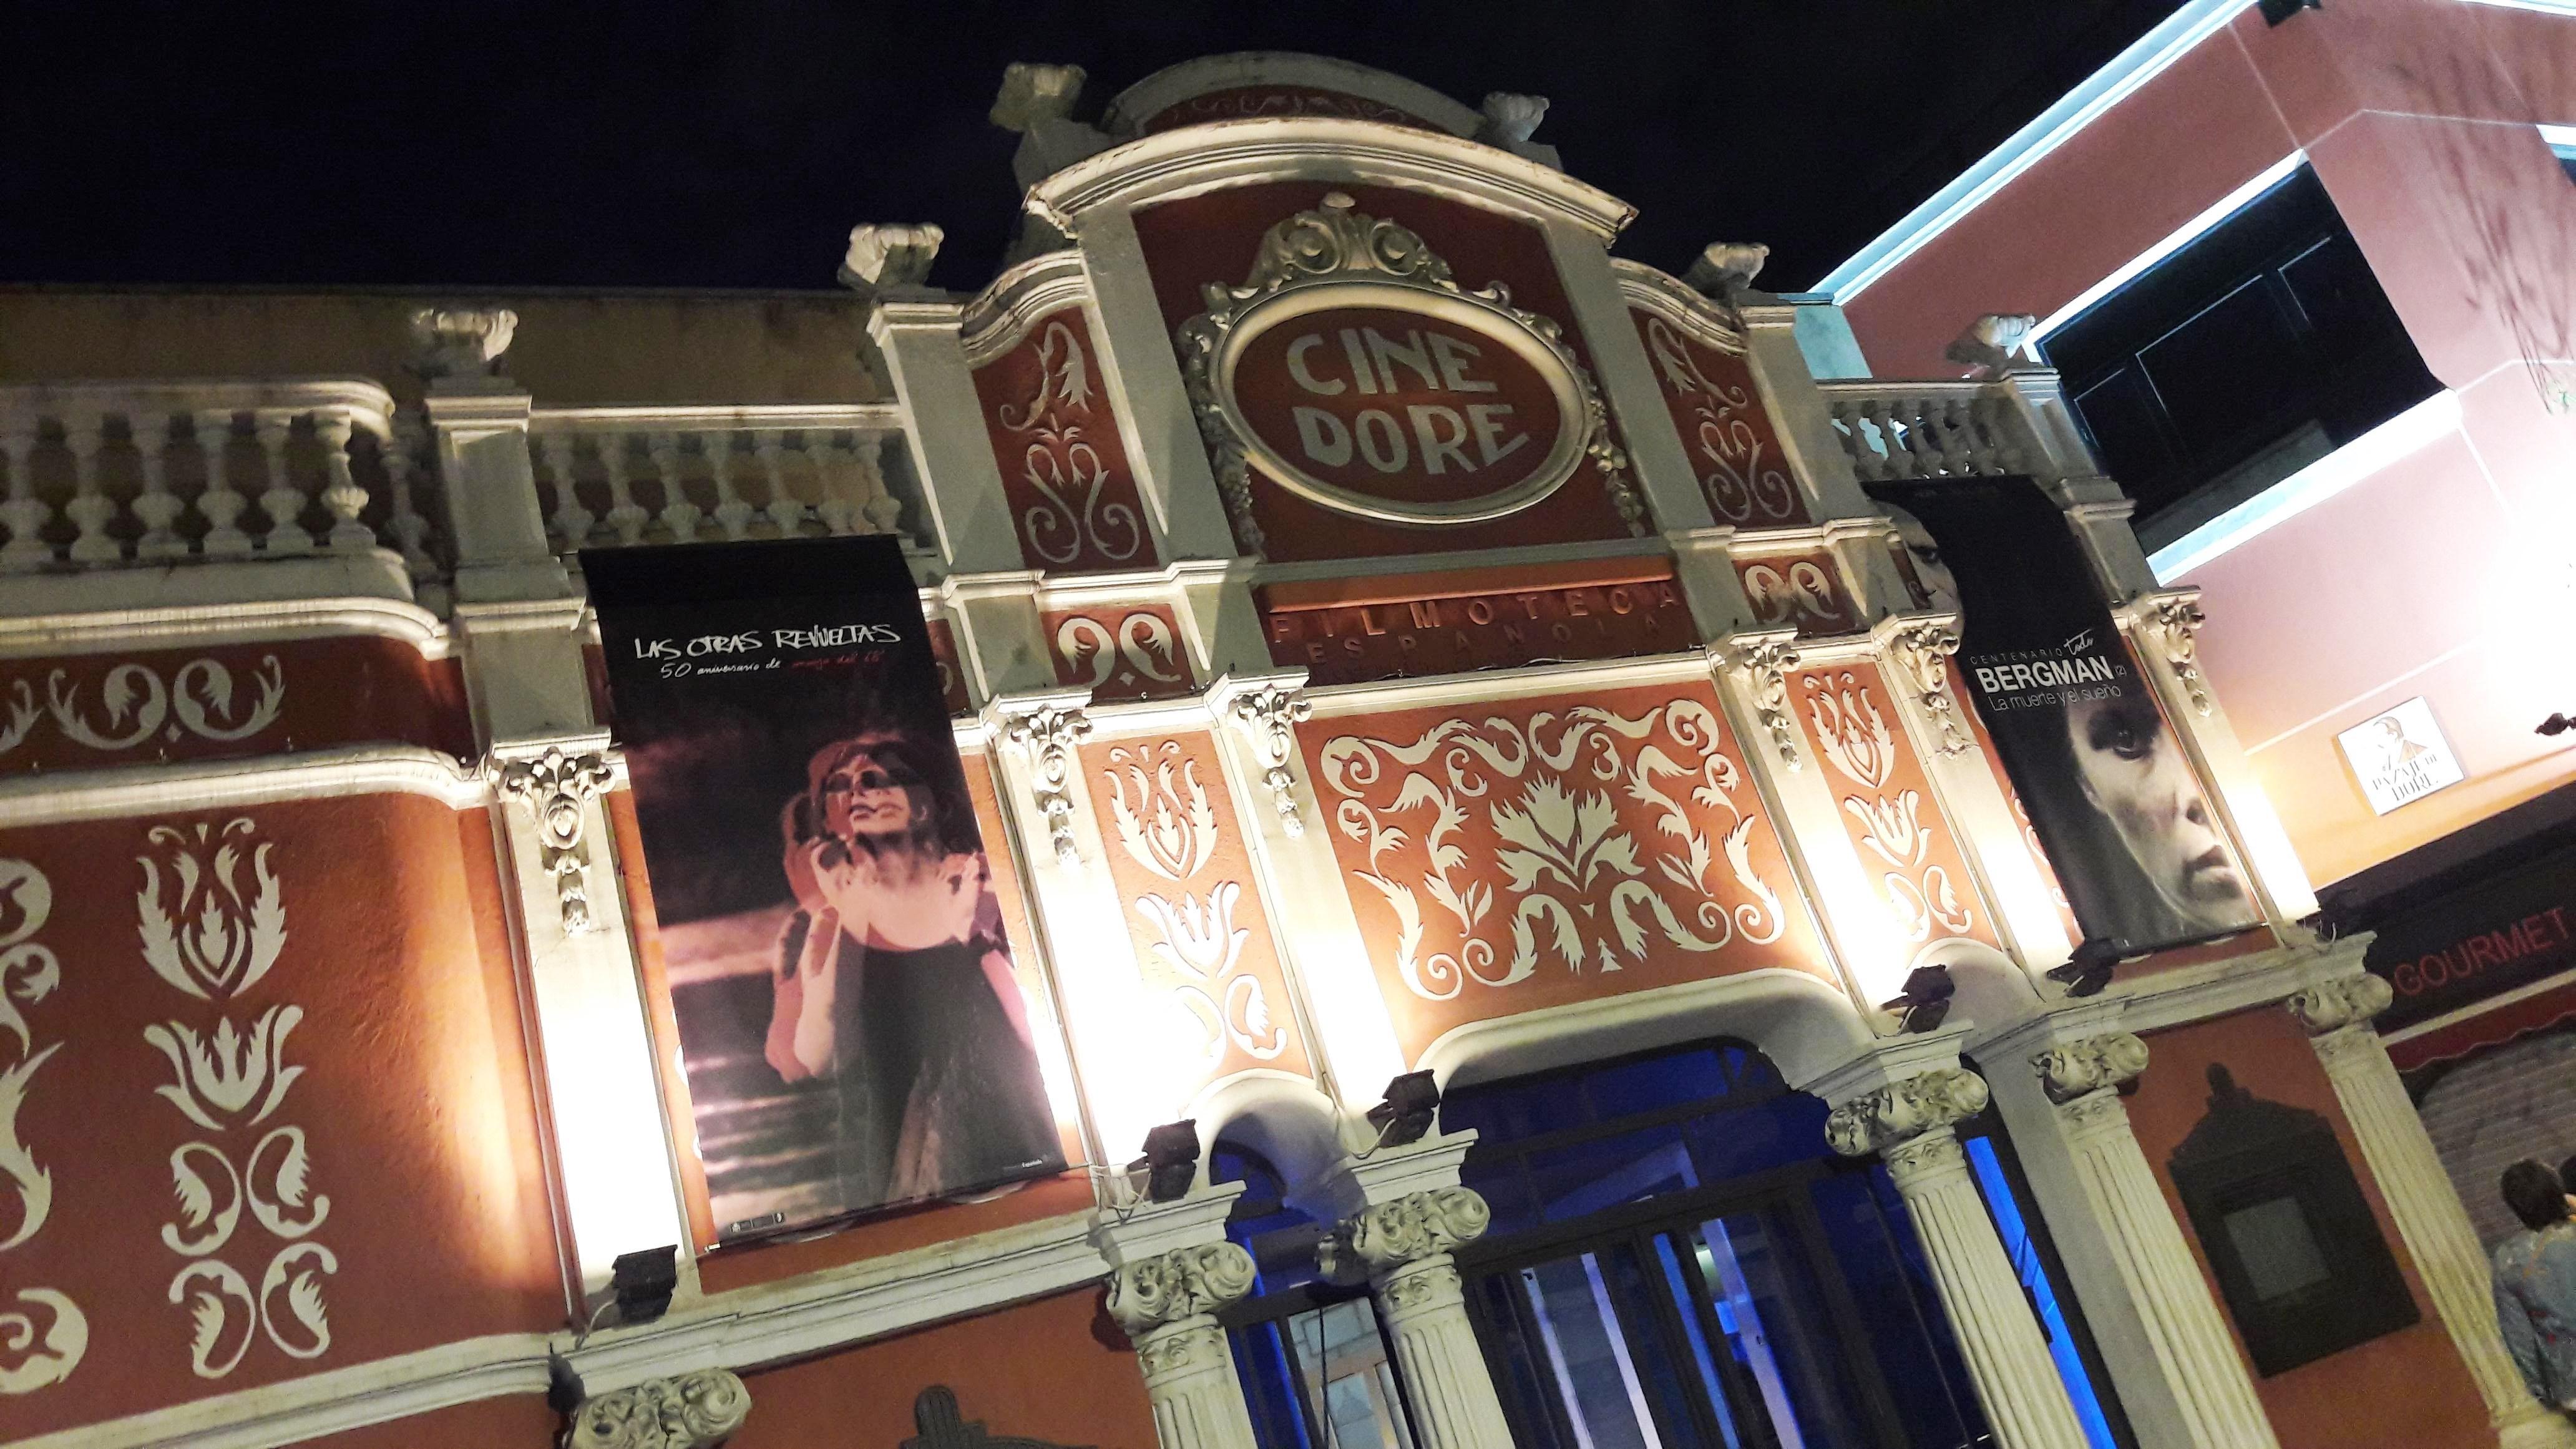 Cine Dore (Madrid)